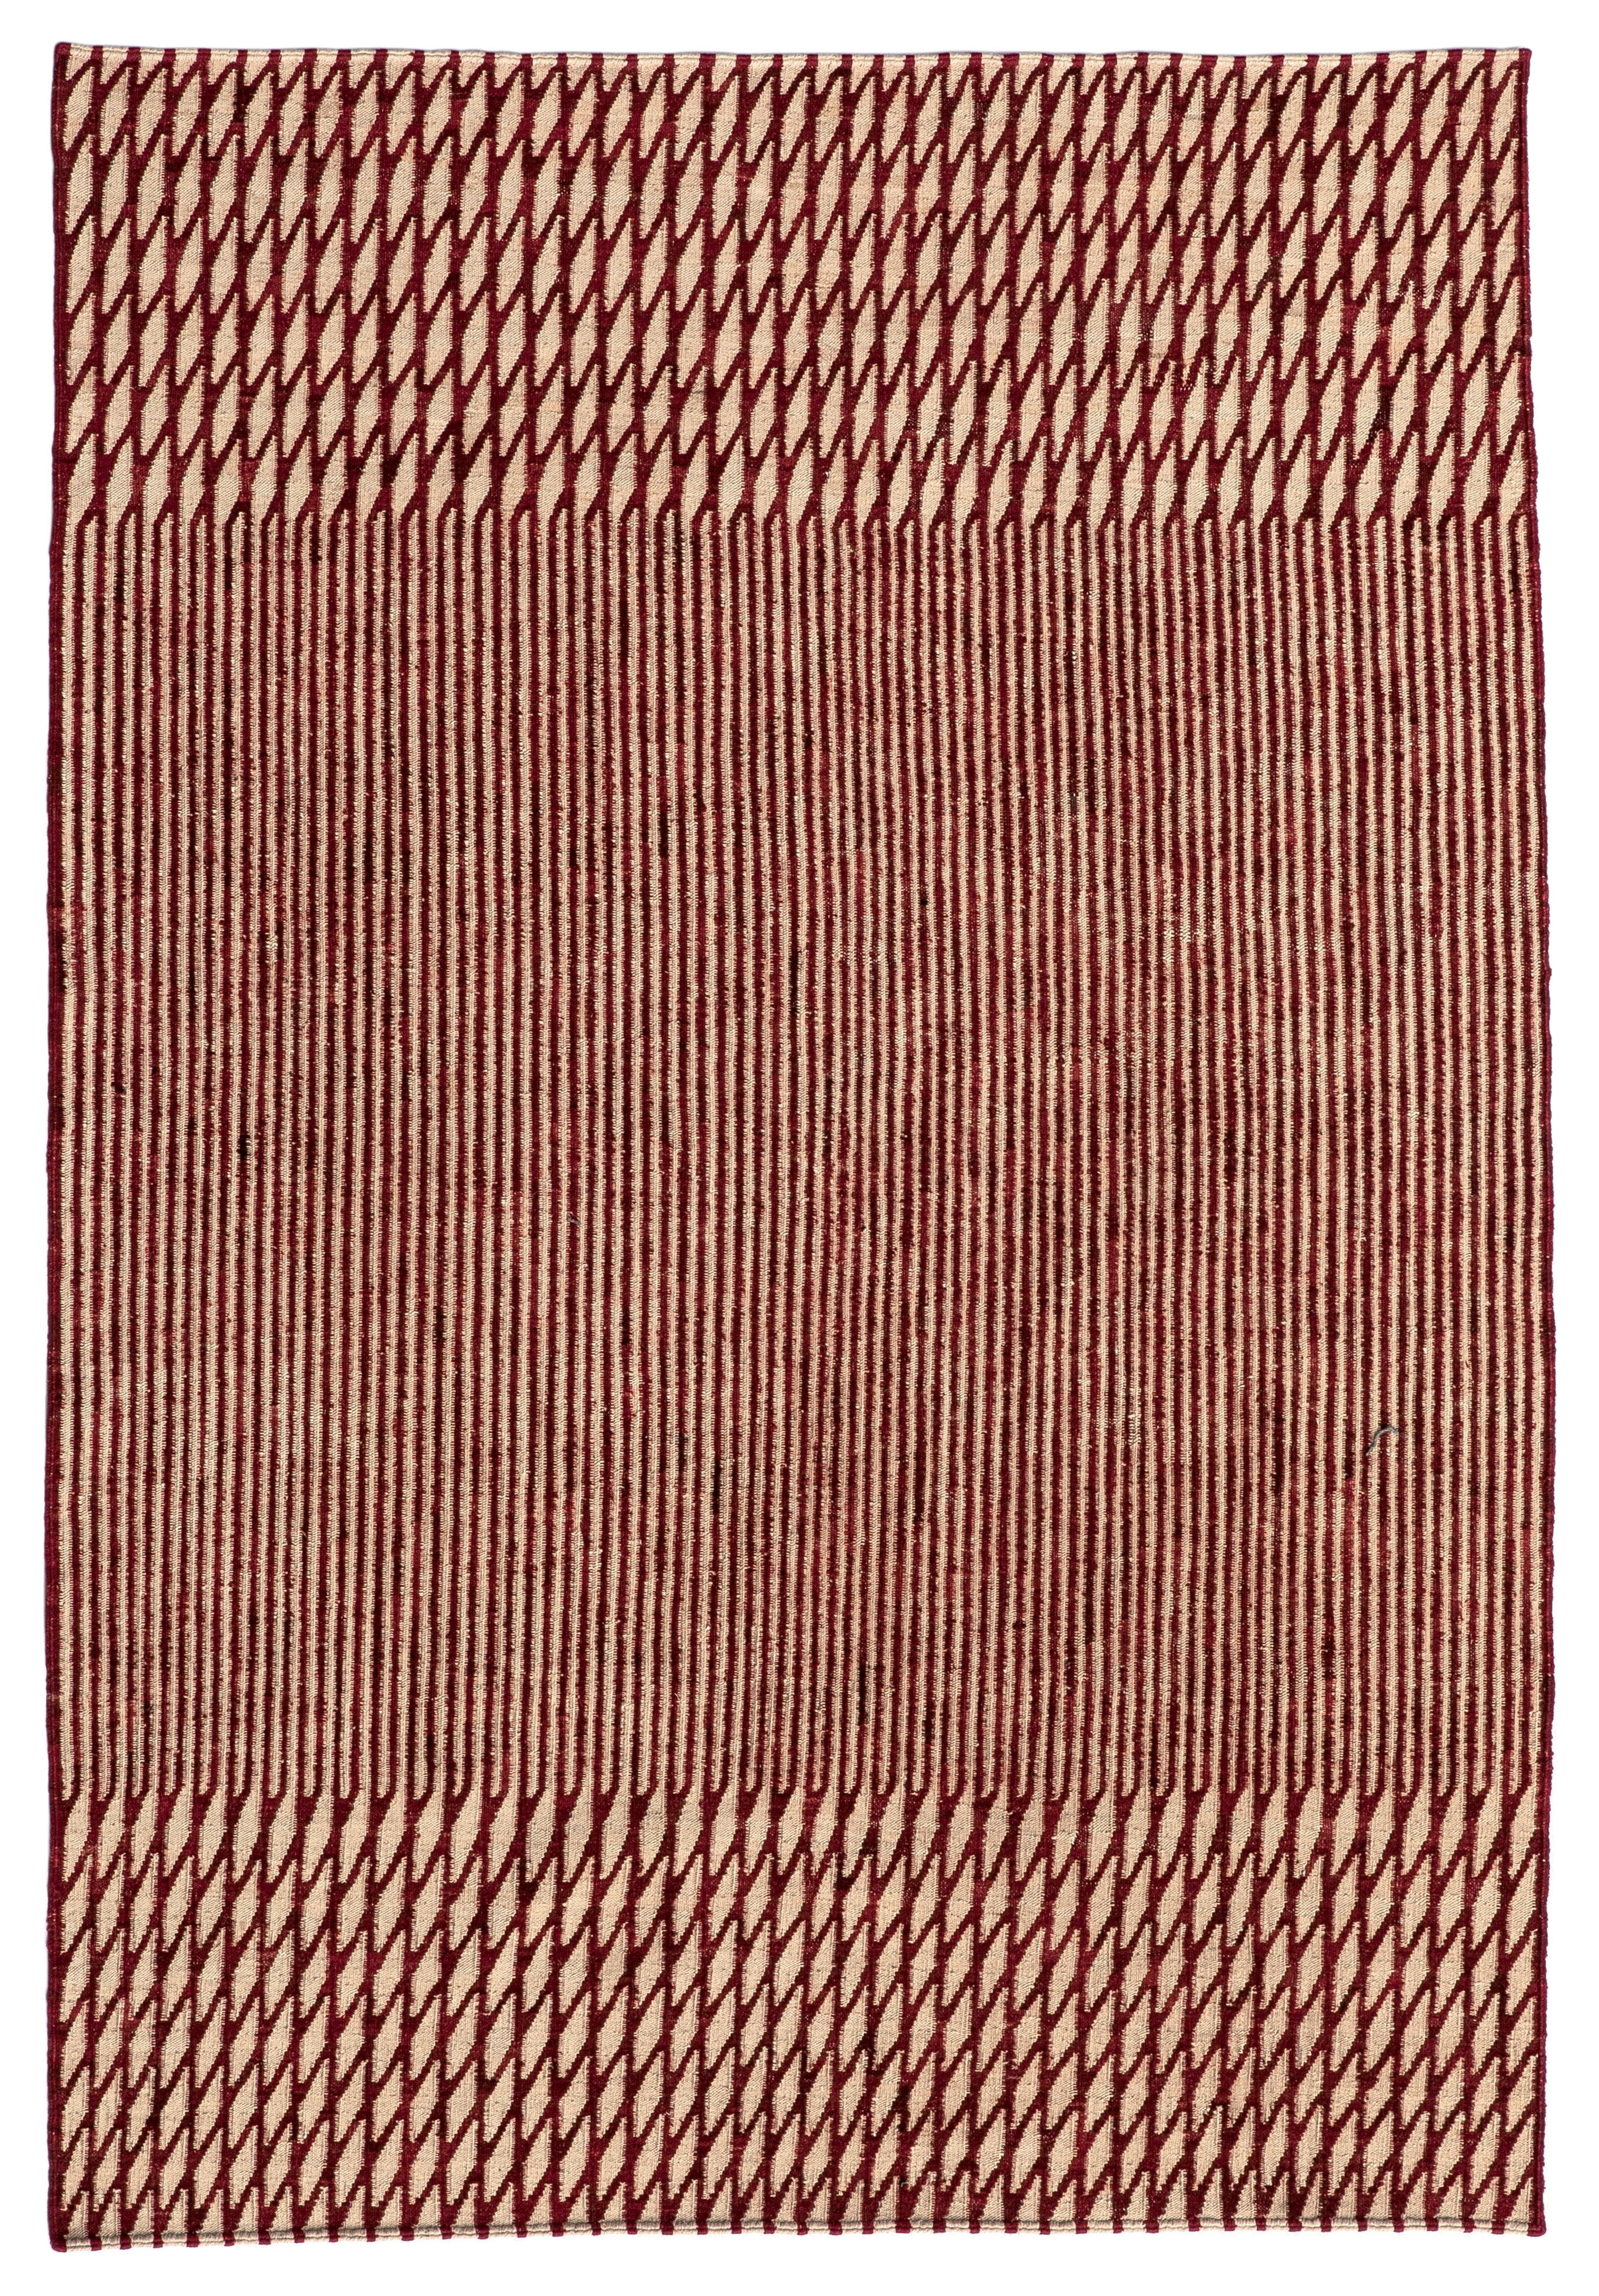 Decoration - Rugs - Blur Rug - / Afghan wool - 170 x 240 cm by Nanimarquina - Red - Wool